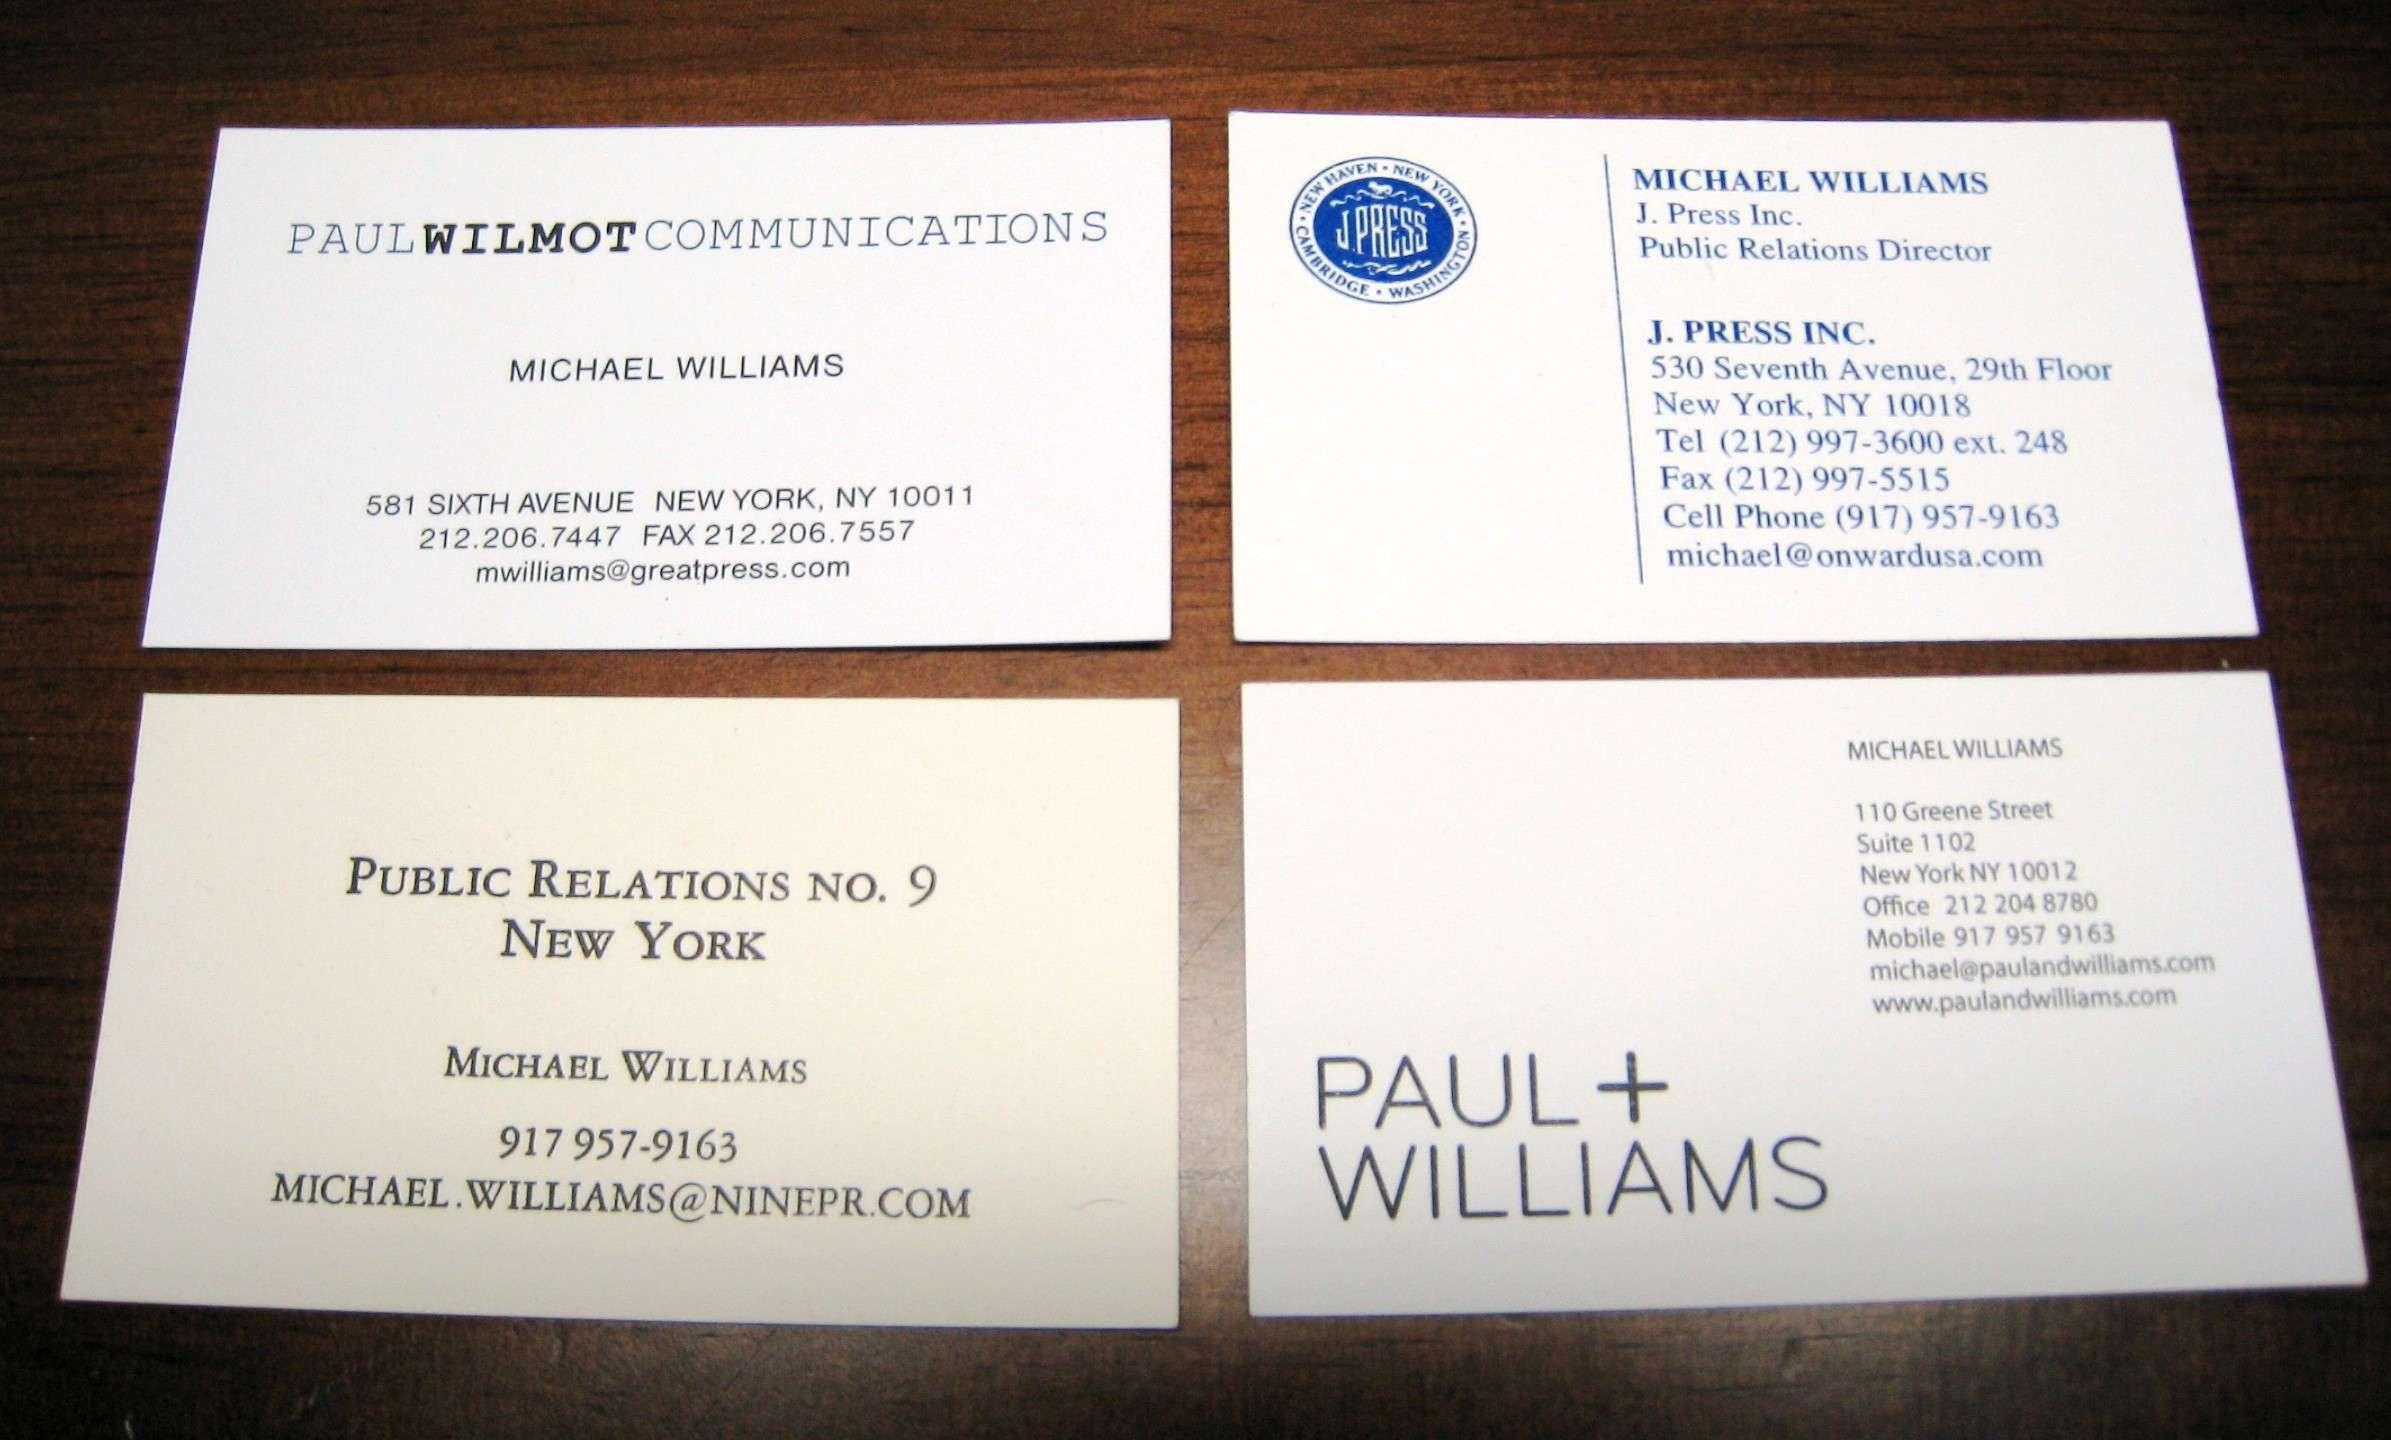 20 Patrick Bateman Business Card Template 20 American Psycho Business Card Template New Print Business Card Template Card Template Rack Card Templates